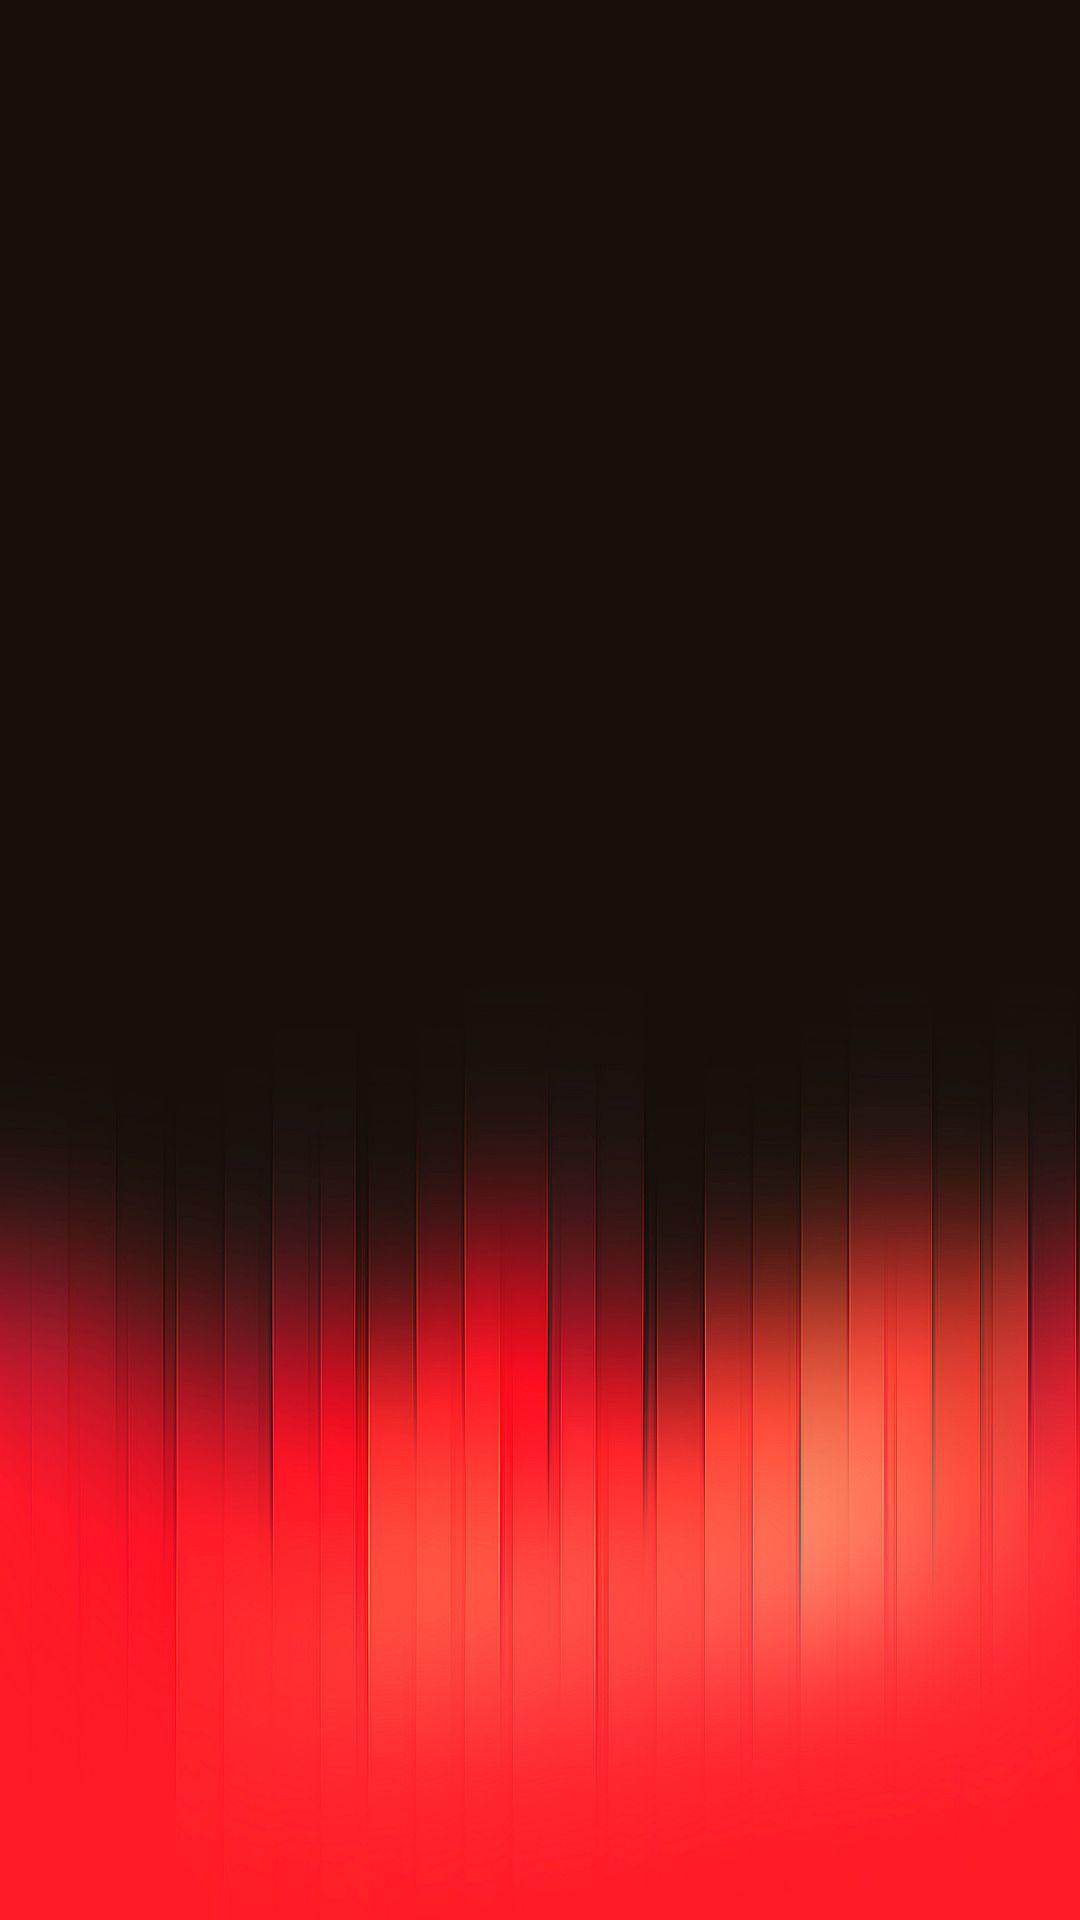 Red Oled Wallpaper 10801920 Red And Black Wallpaper Cute Wallpapers Dark Wallpaper